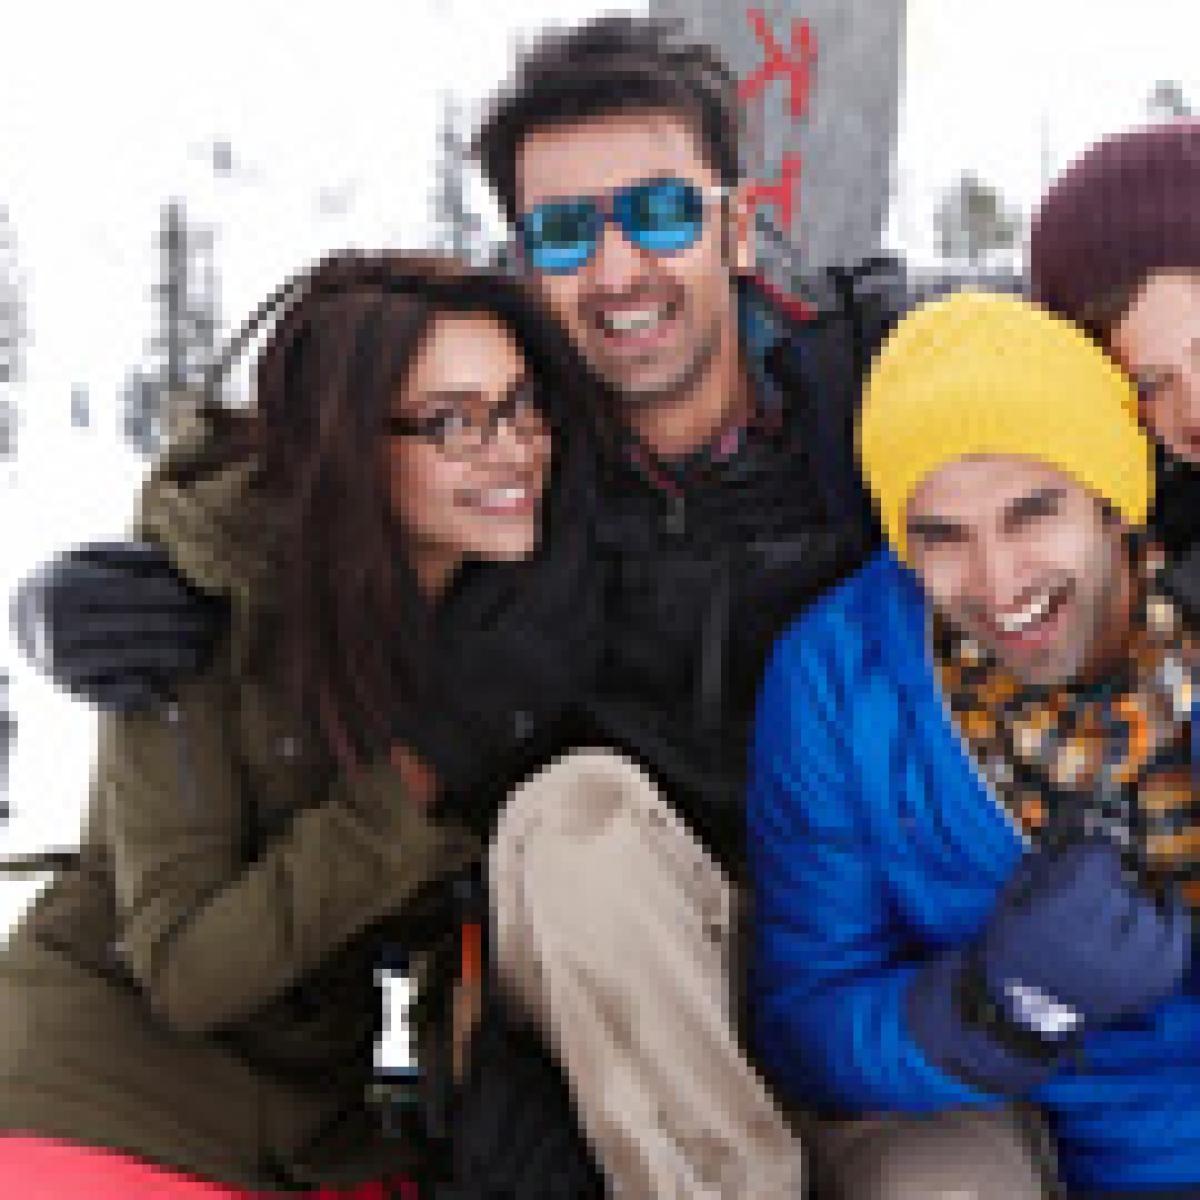 Karan Johar gets nostalgic as 'Yeh Jawaani Hai Deewani' clocks 7 years